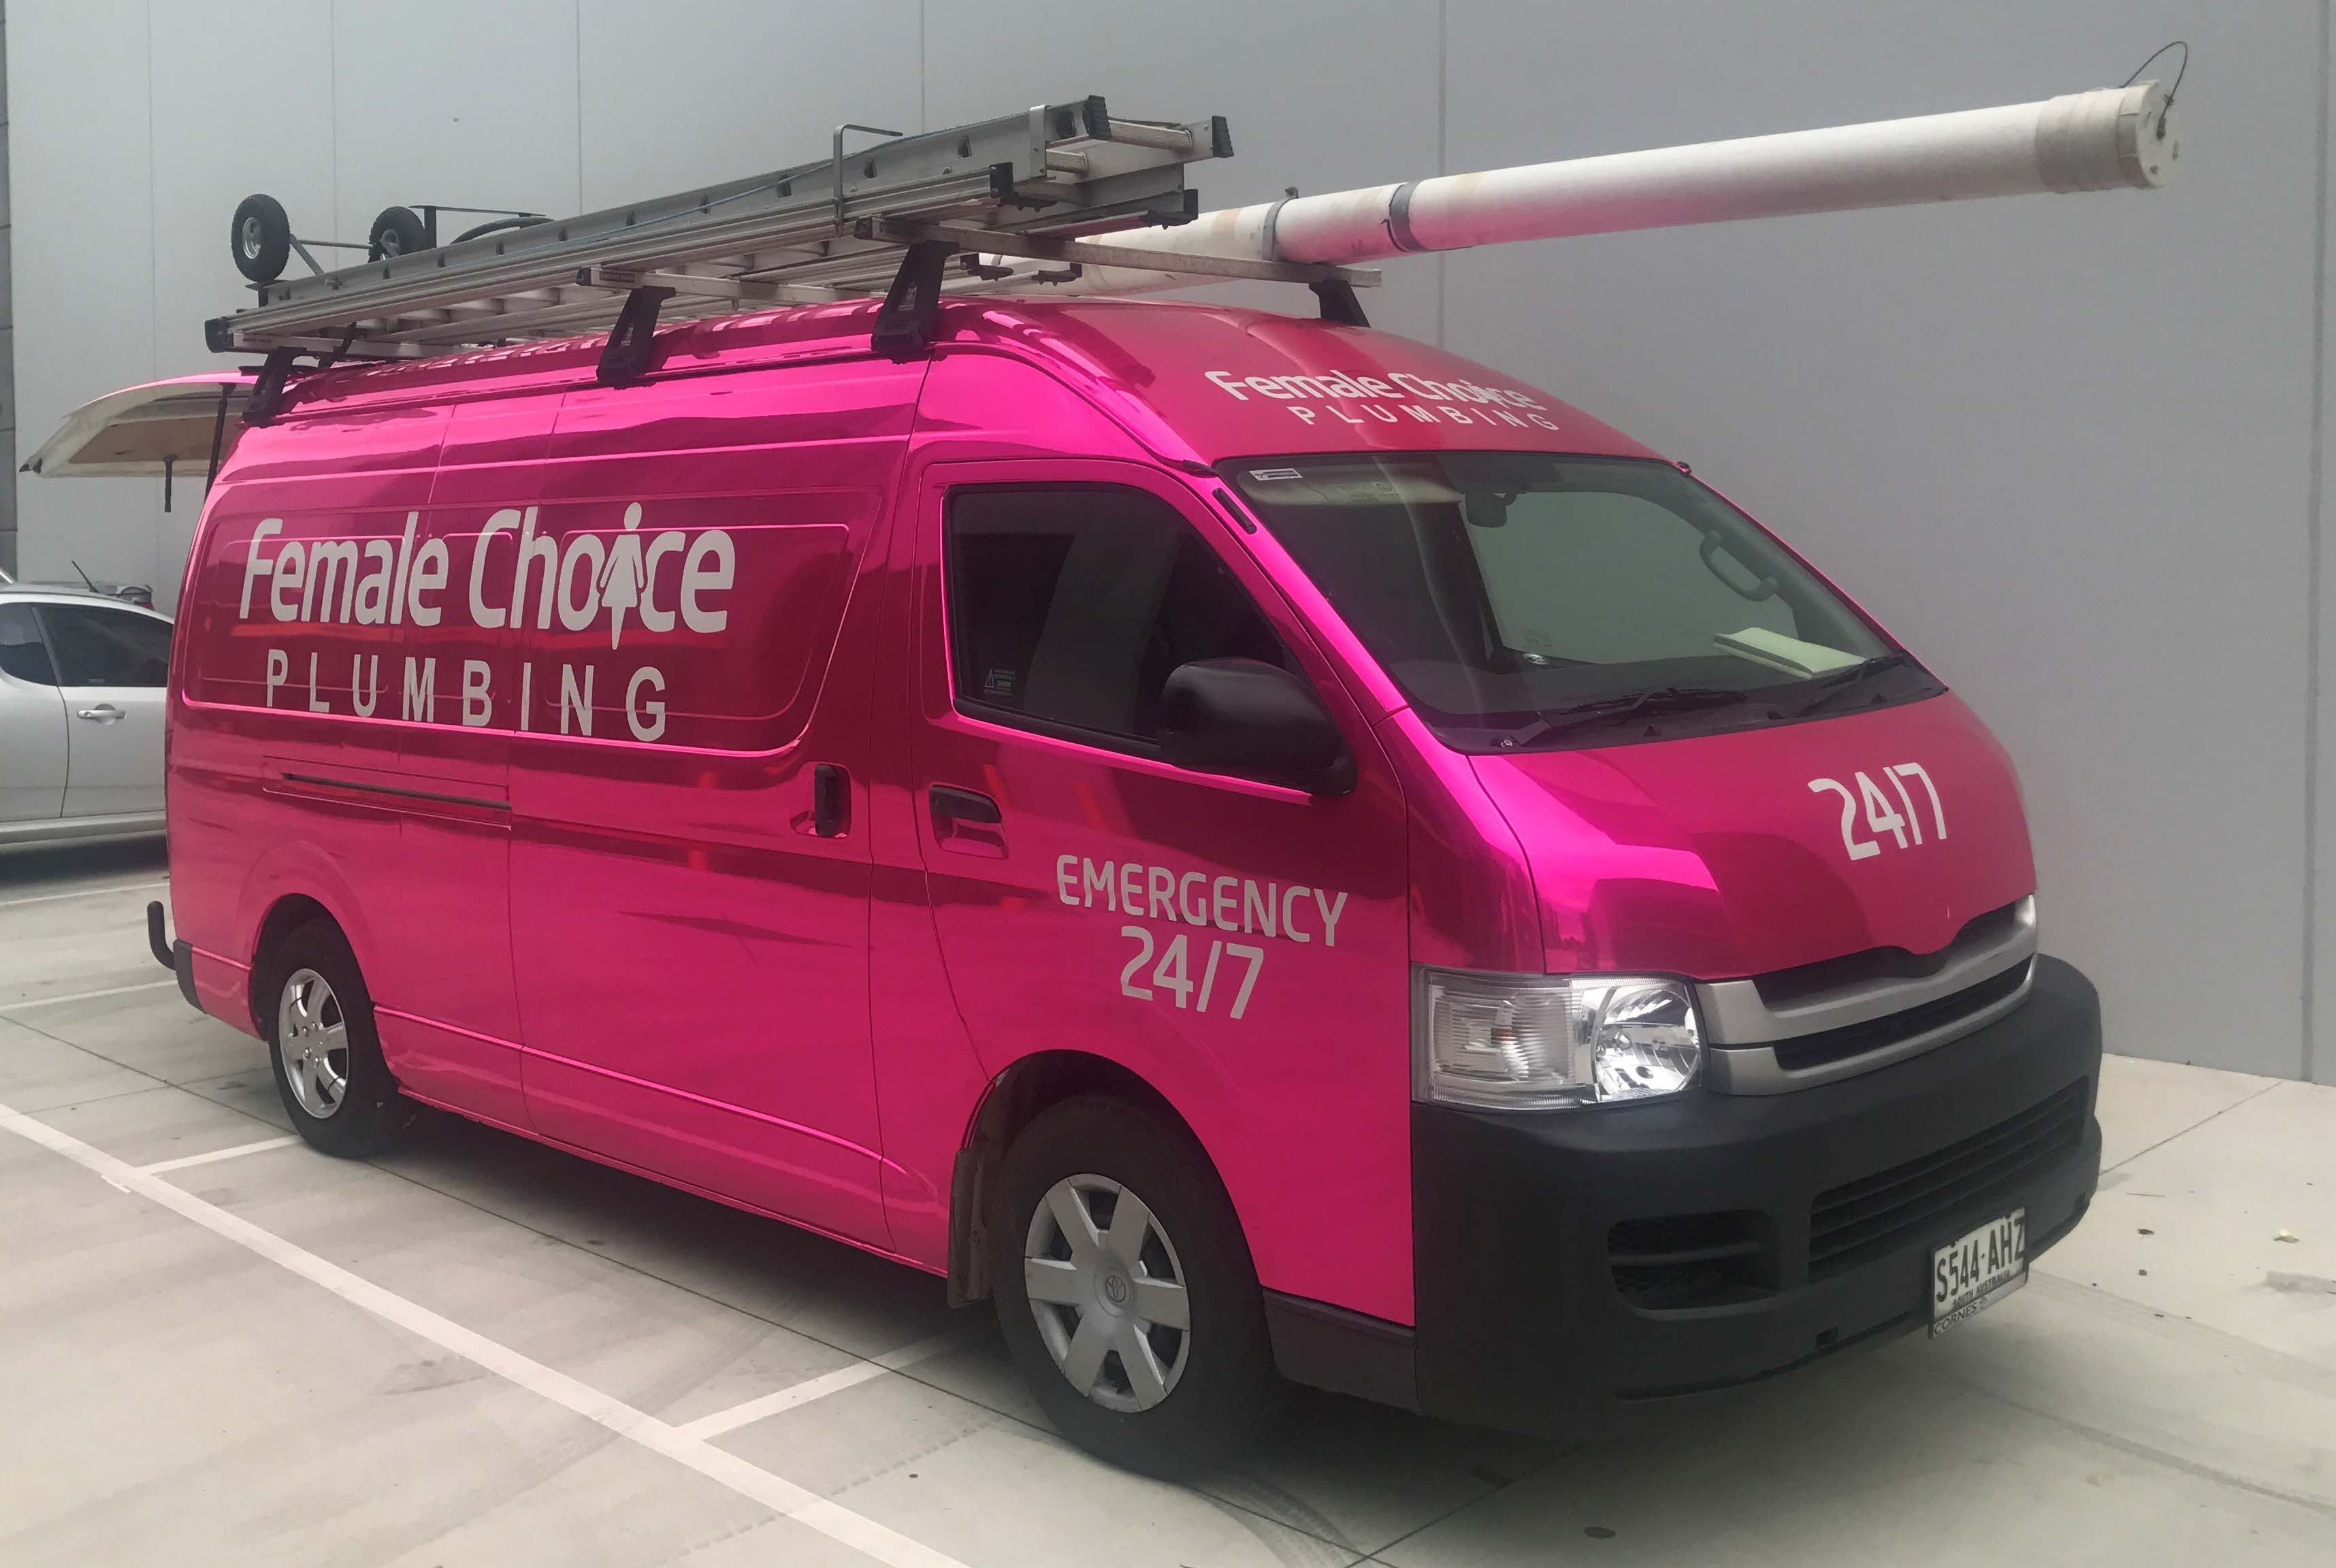 Pin by Female Choice Plumbing on Female Choice Plumbing